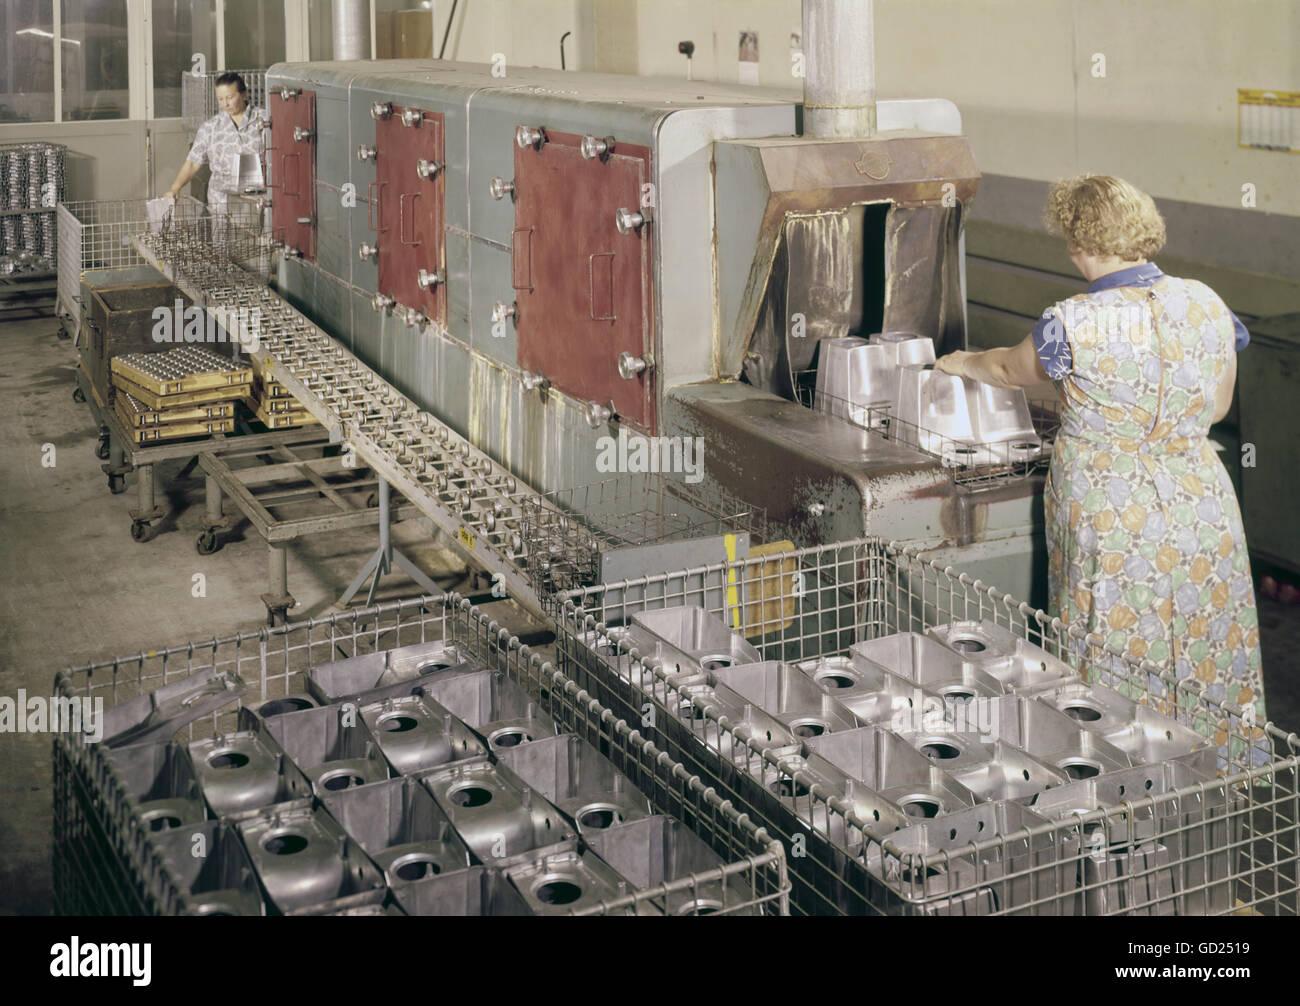 gastronomy, dishwashing service, women at dishwasher, 1959/1960, Additional-Rights-Clearences-NA - Stock Image